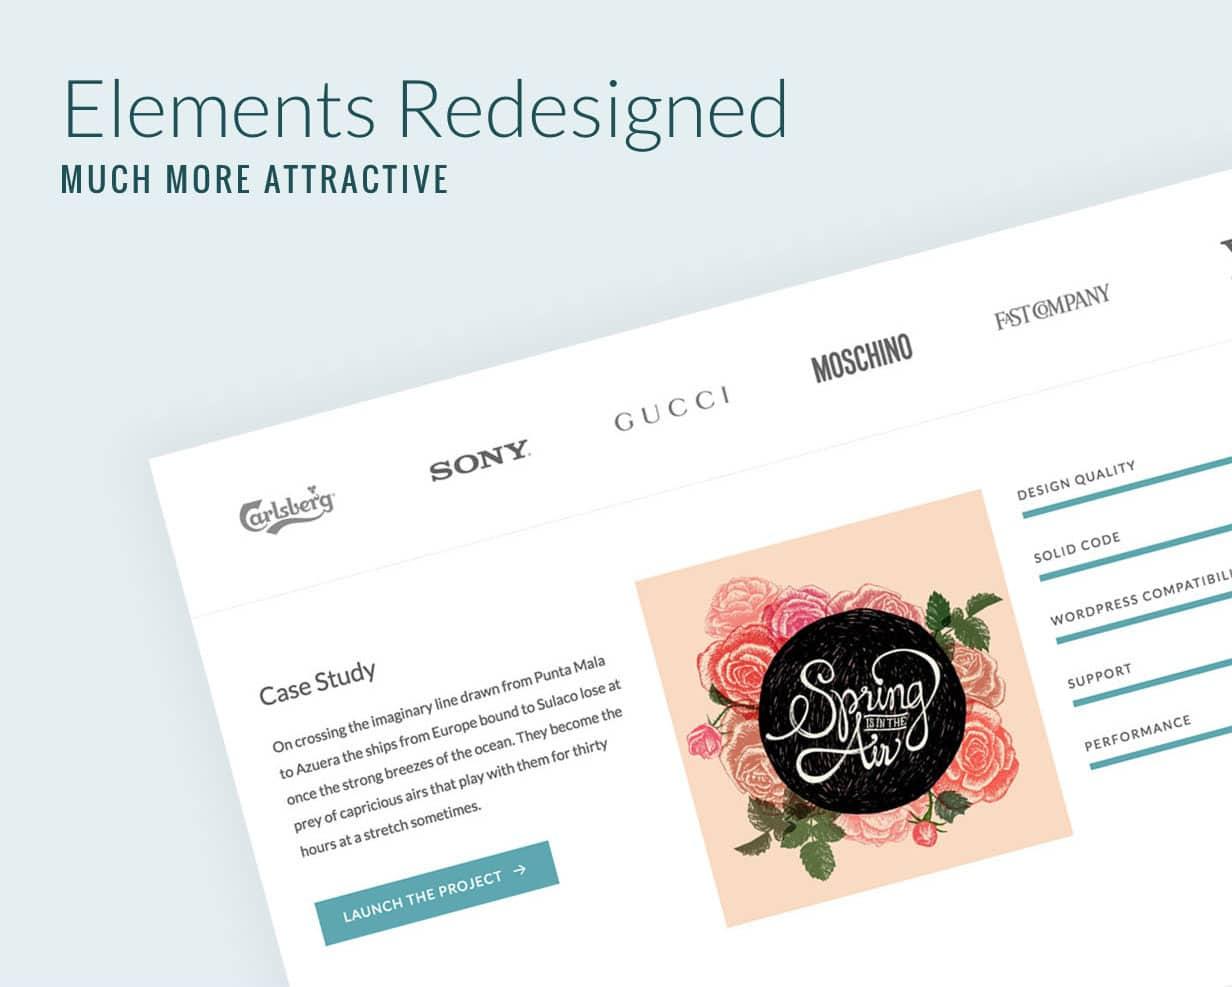 687474703a2f2f73696d706c652d656c6567616e742e77697468656d65732e636f6d2f6465736372697074696f6e2f77702d636f6e74656e742f75706c6f6164732f73697465732f342f323031362f31312f656c656d656e74732e6a7067 - Simple & Elegant - Multi-Purpose WordPress Theme